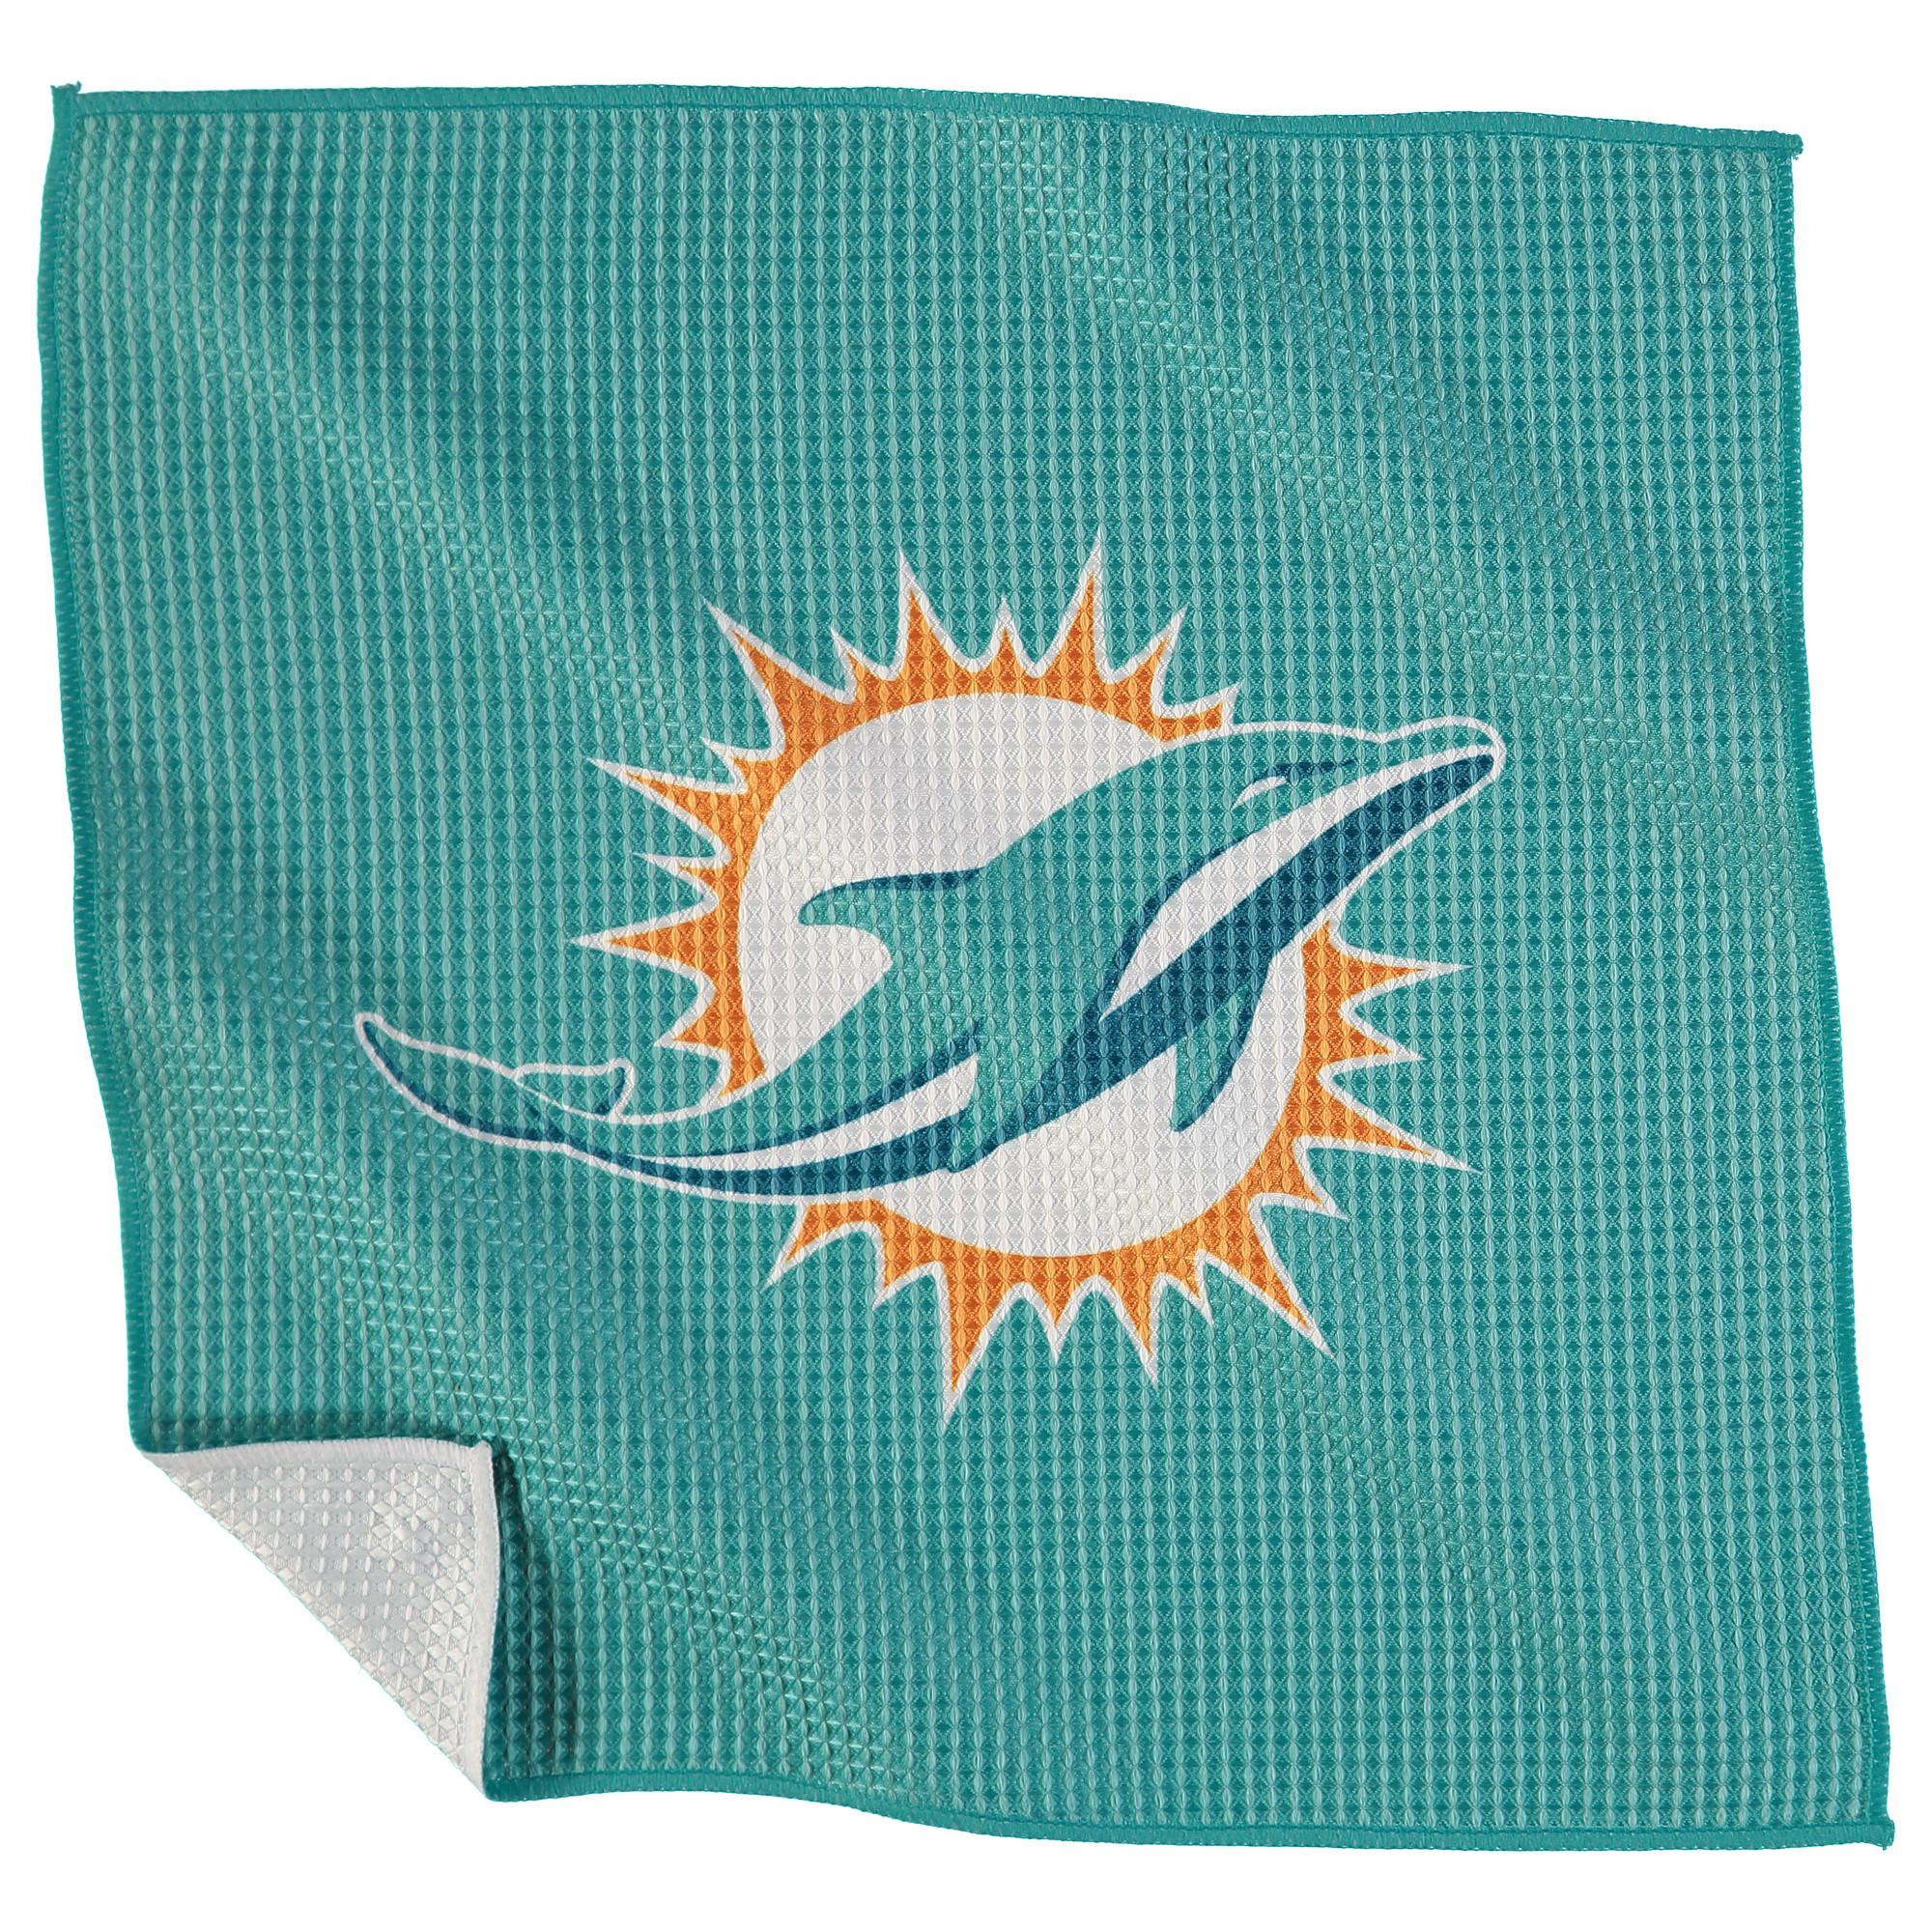 "Miami Dolphins 16"" x 16"" Microfiber Towel - No Size"